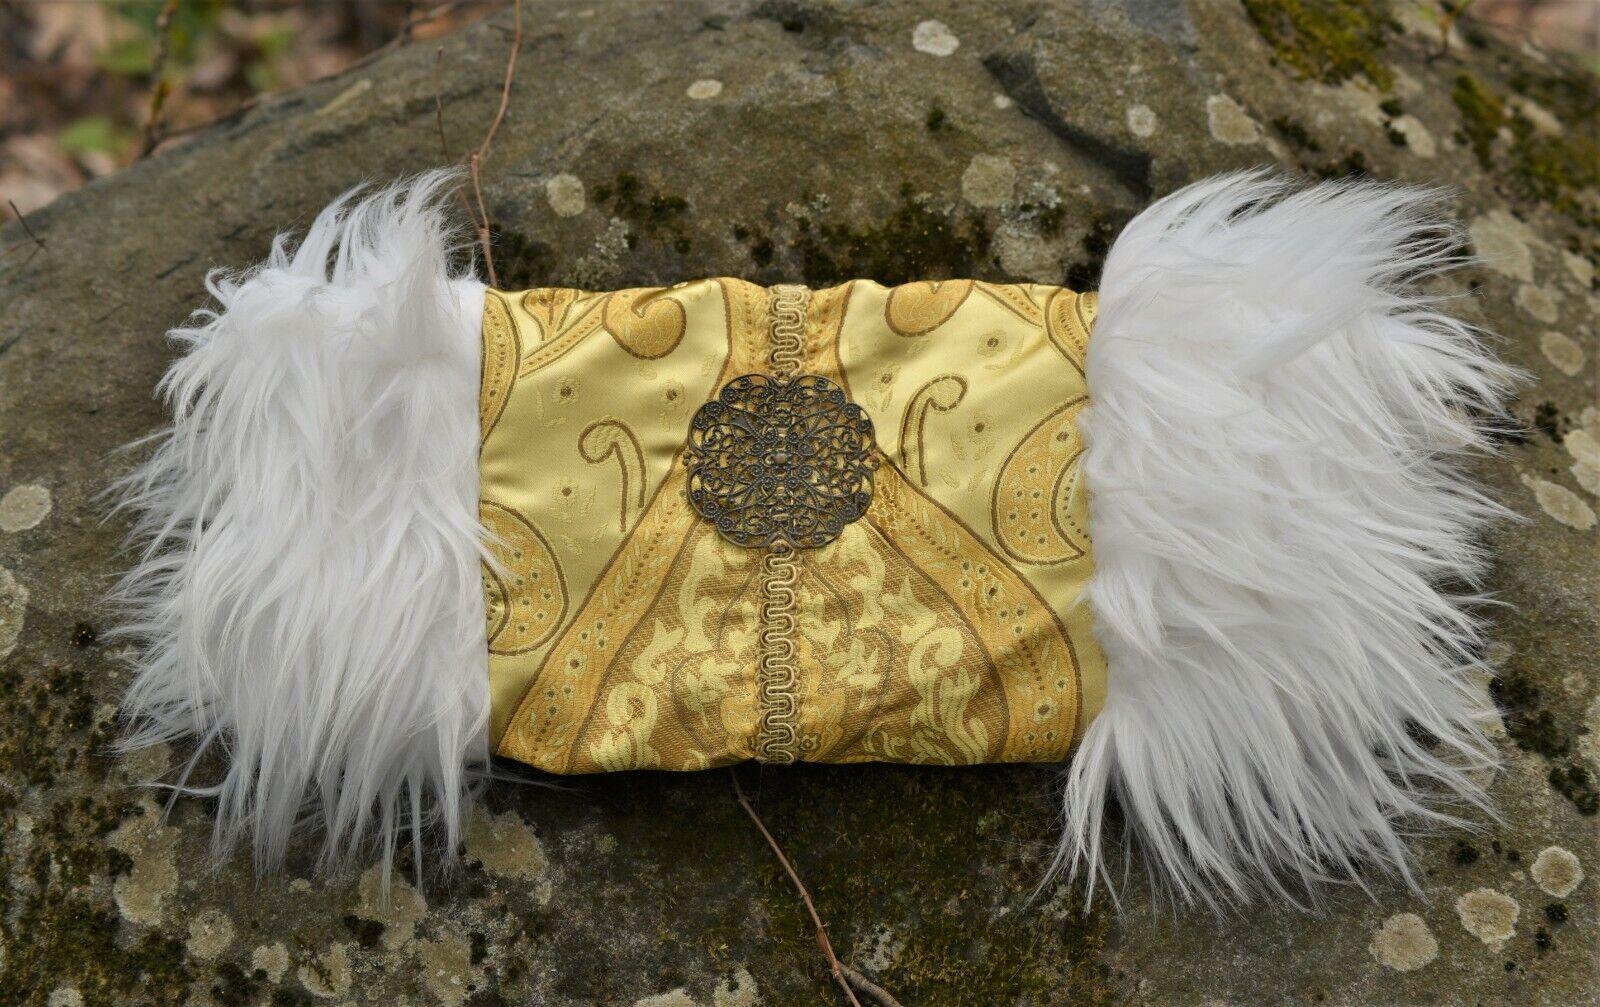 Victorian Steampunk Muff Hand Warmer White Fur, Gold Embroidered Brass Ornament